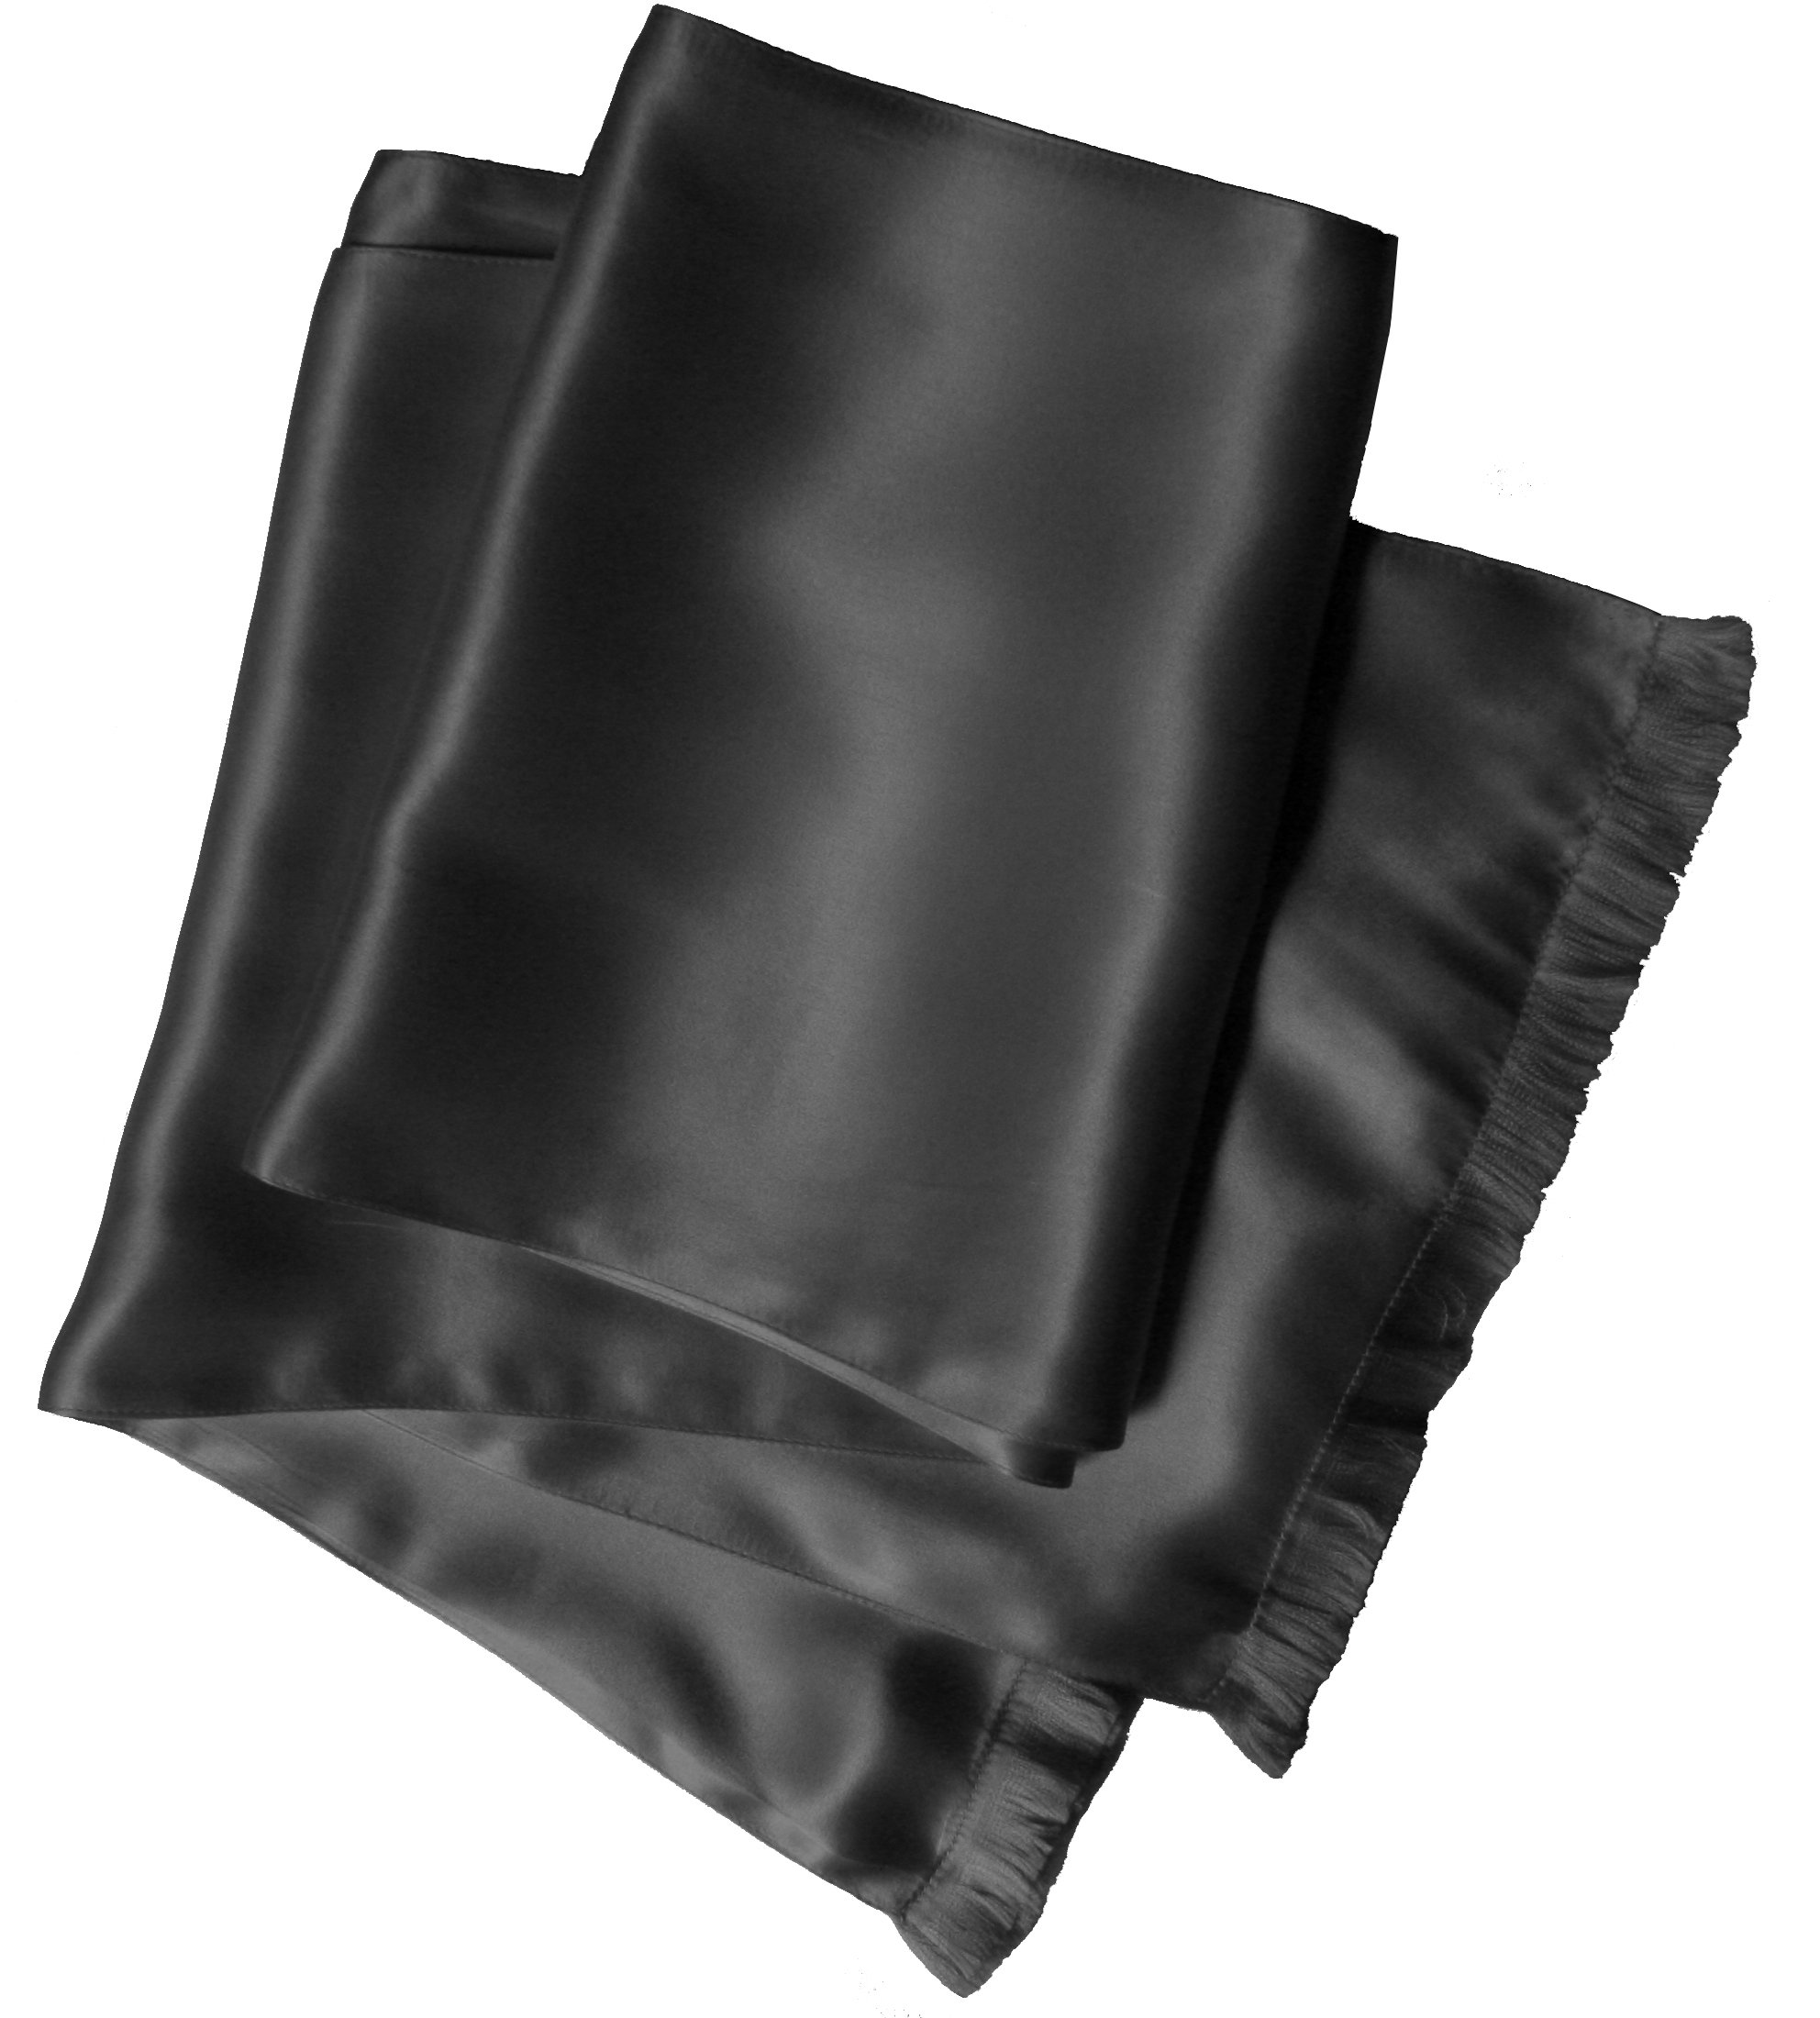 Charcoal Grey Silk Aviator Scarf for Men - Double Layered Satin Silk - Royal Silk